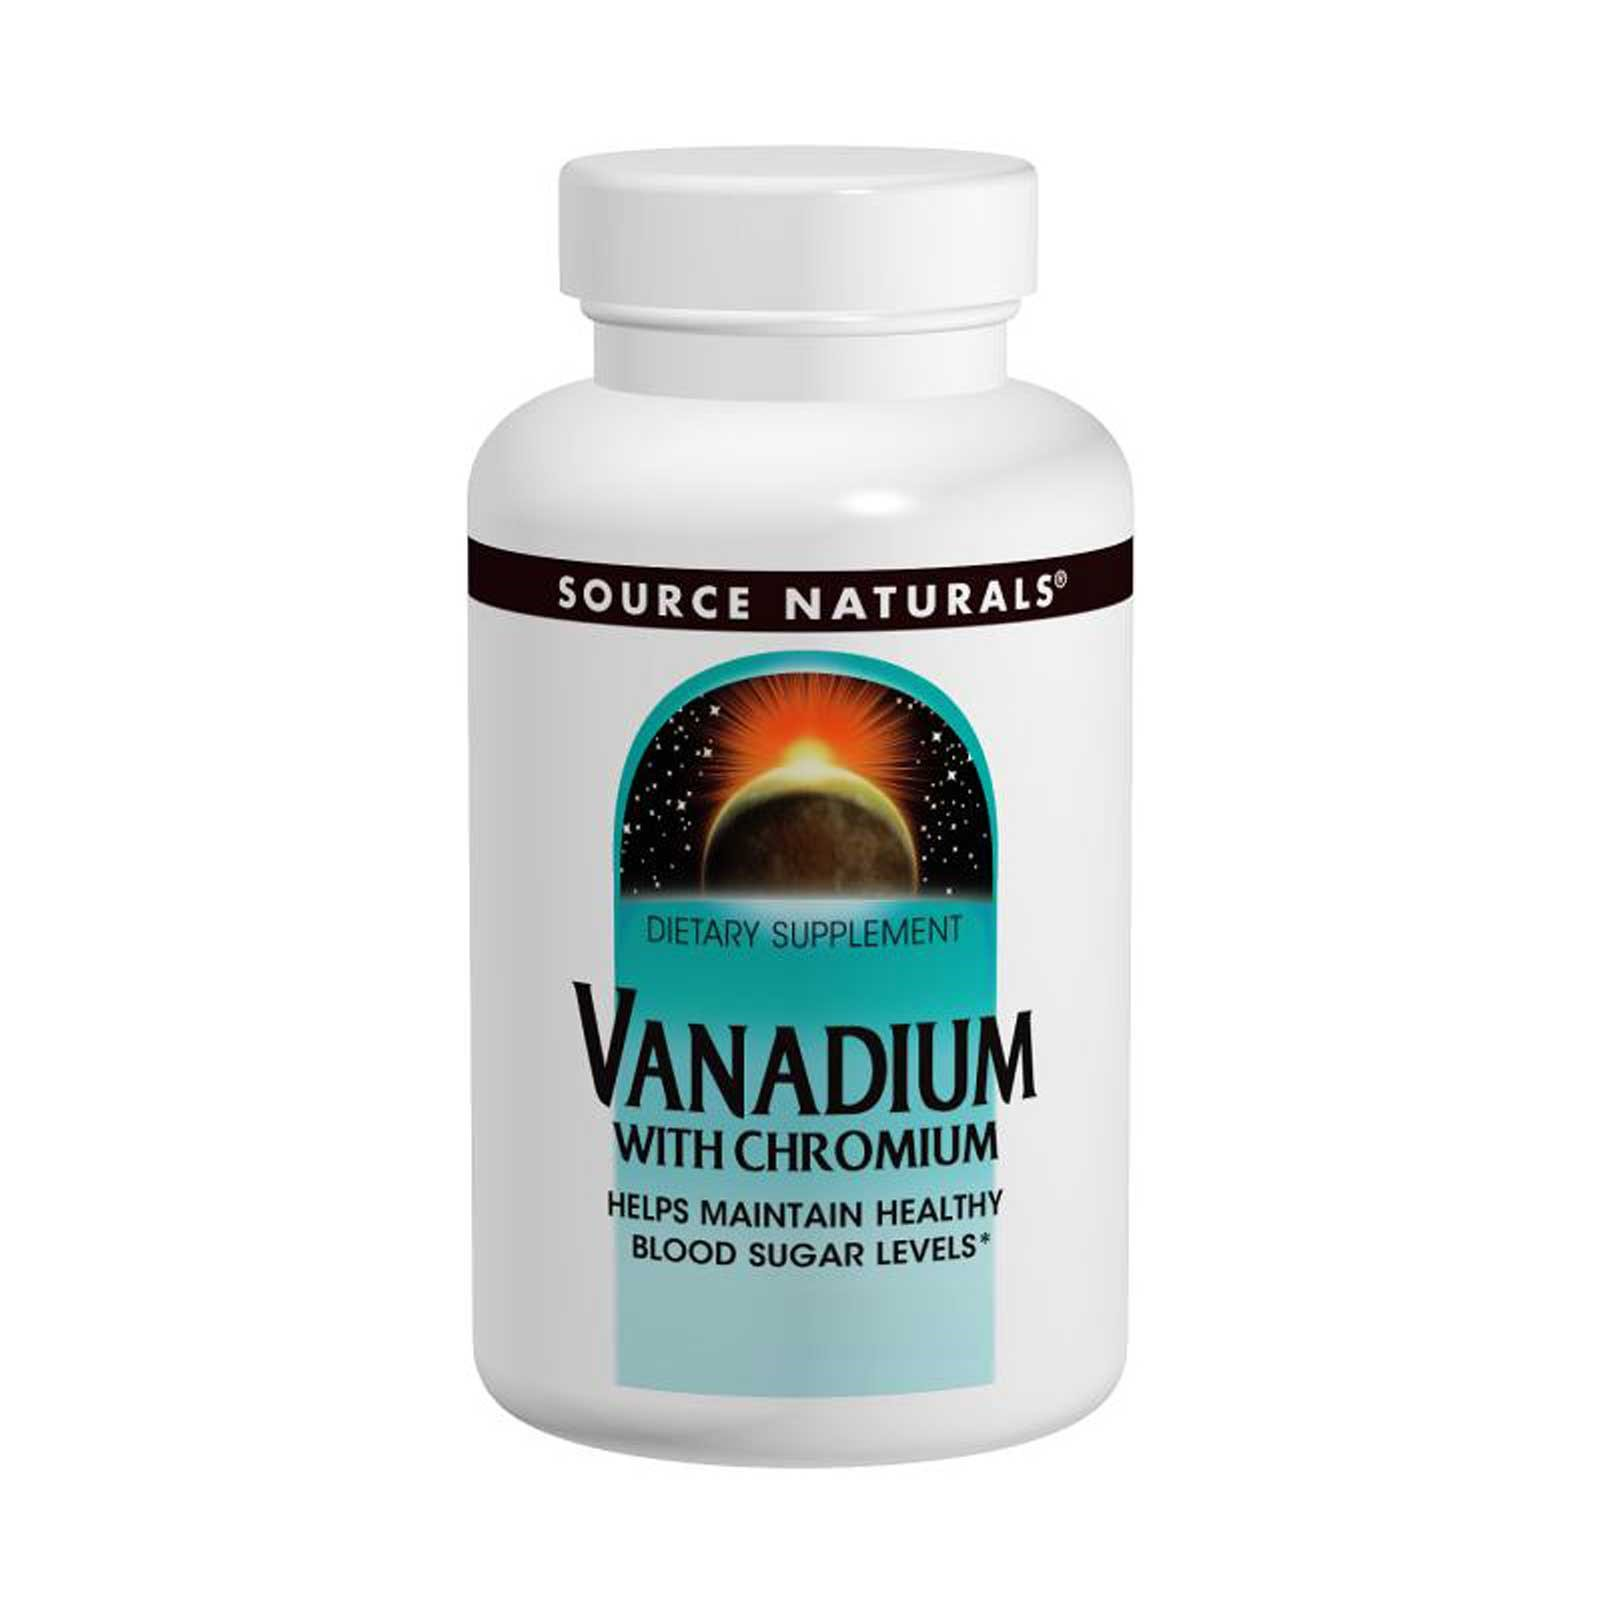 Source Naturals, Vanadium with Chromium, 90 Tablets